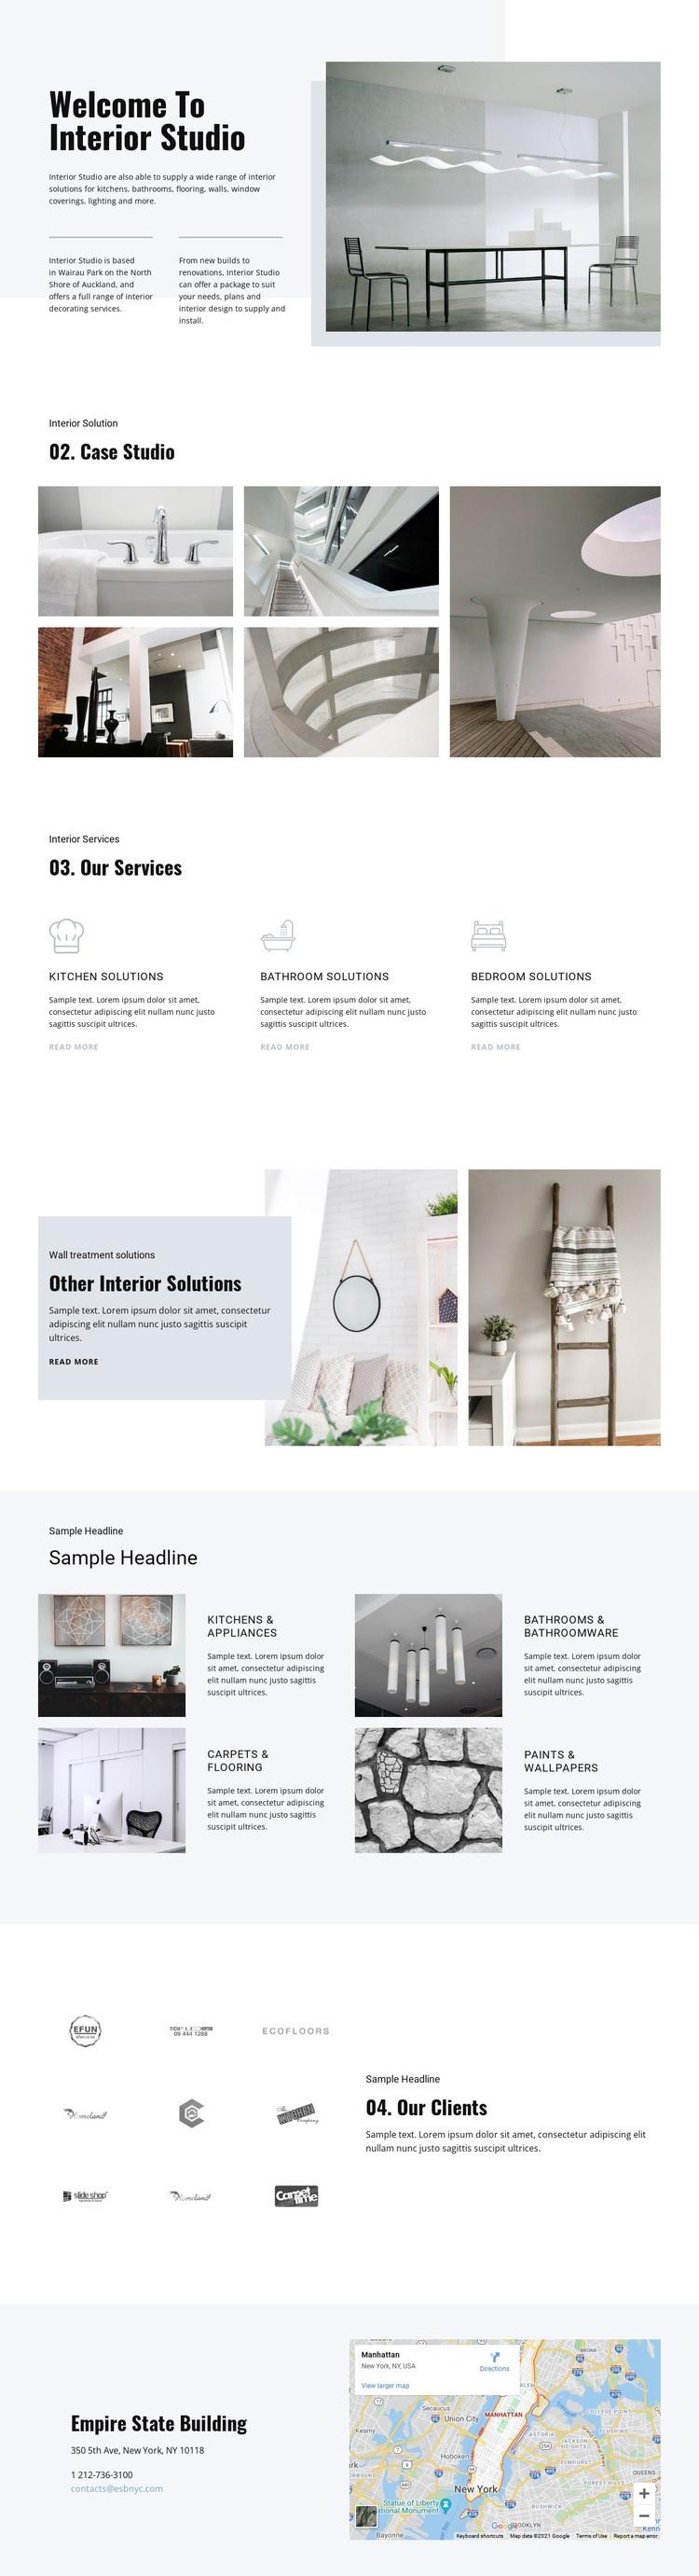 Welcome to interior studio Html Code Example